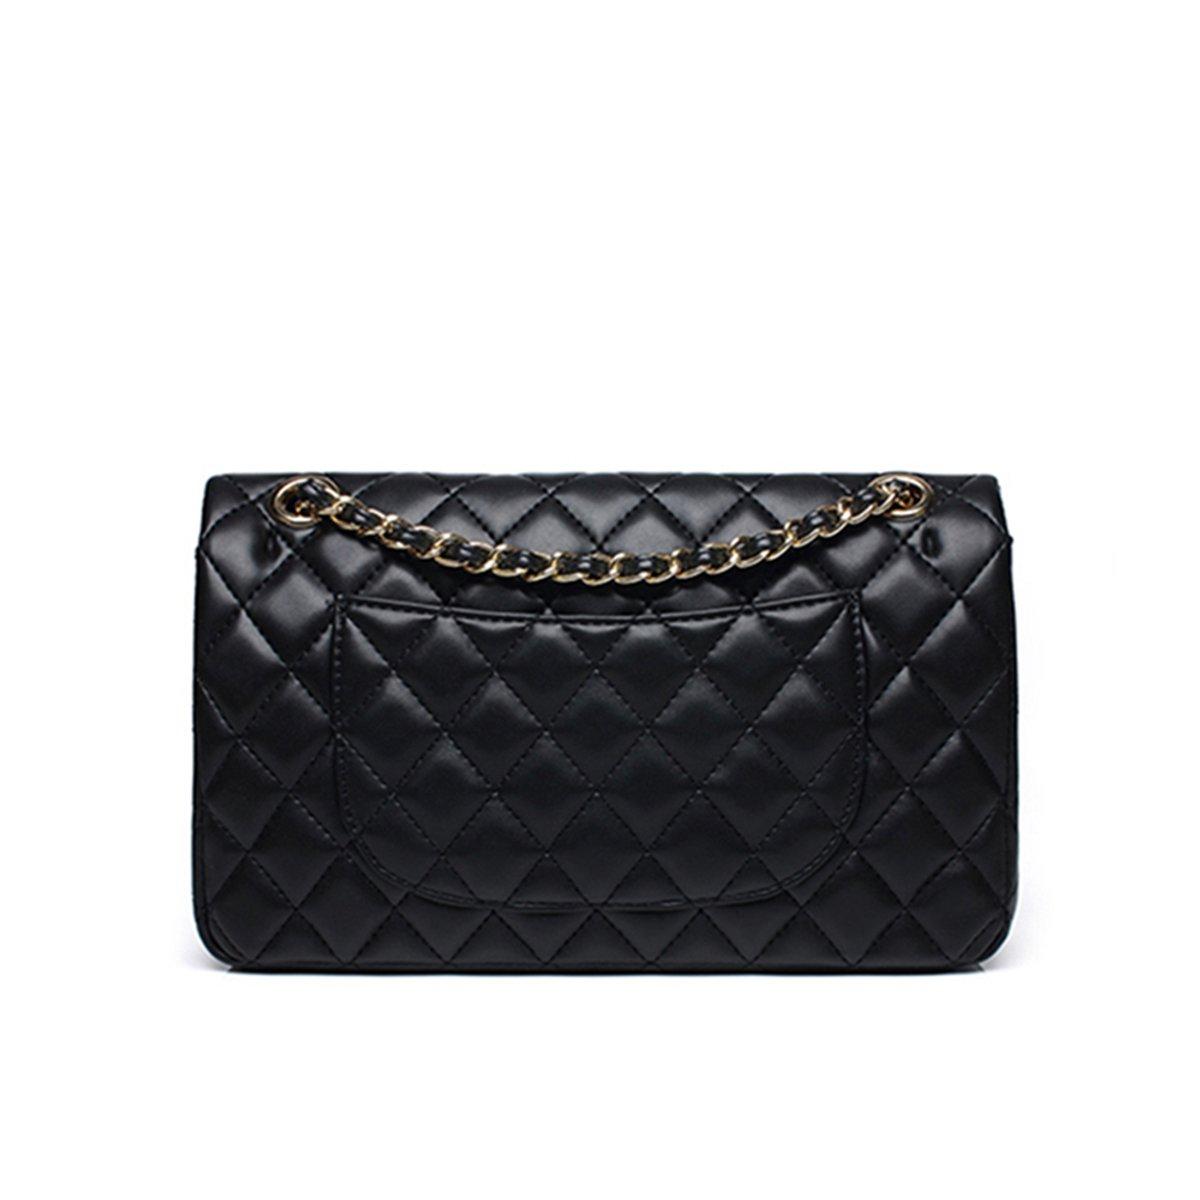 dfa0184fca4cbe Women's Chain Quilted PU Leather Shoulder Bag: Handbags: Amazon.com